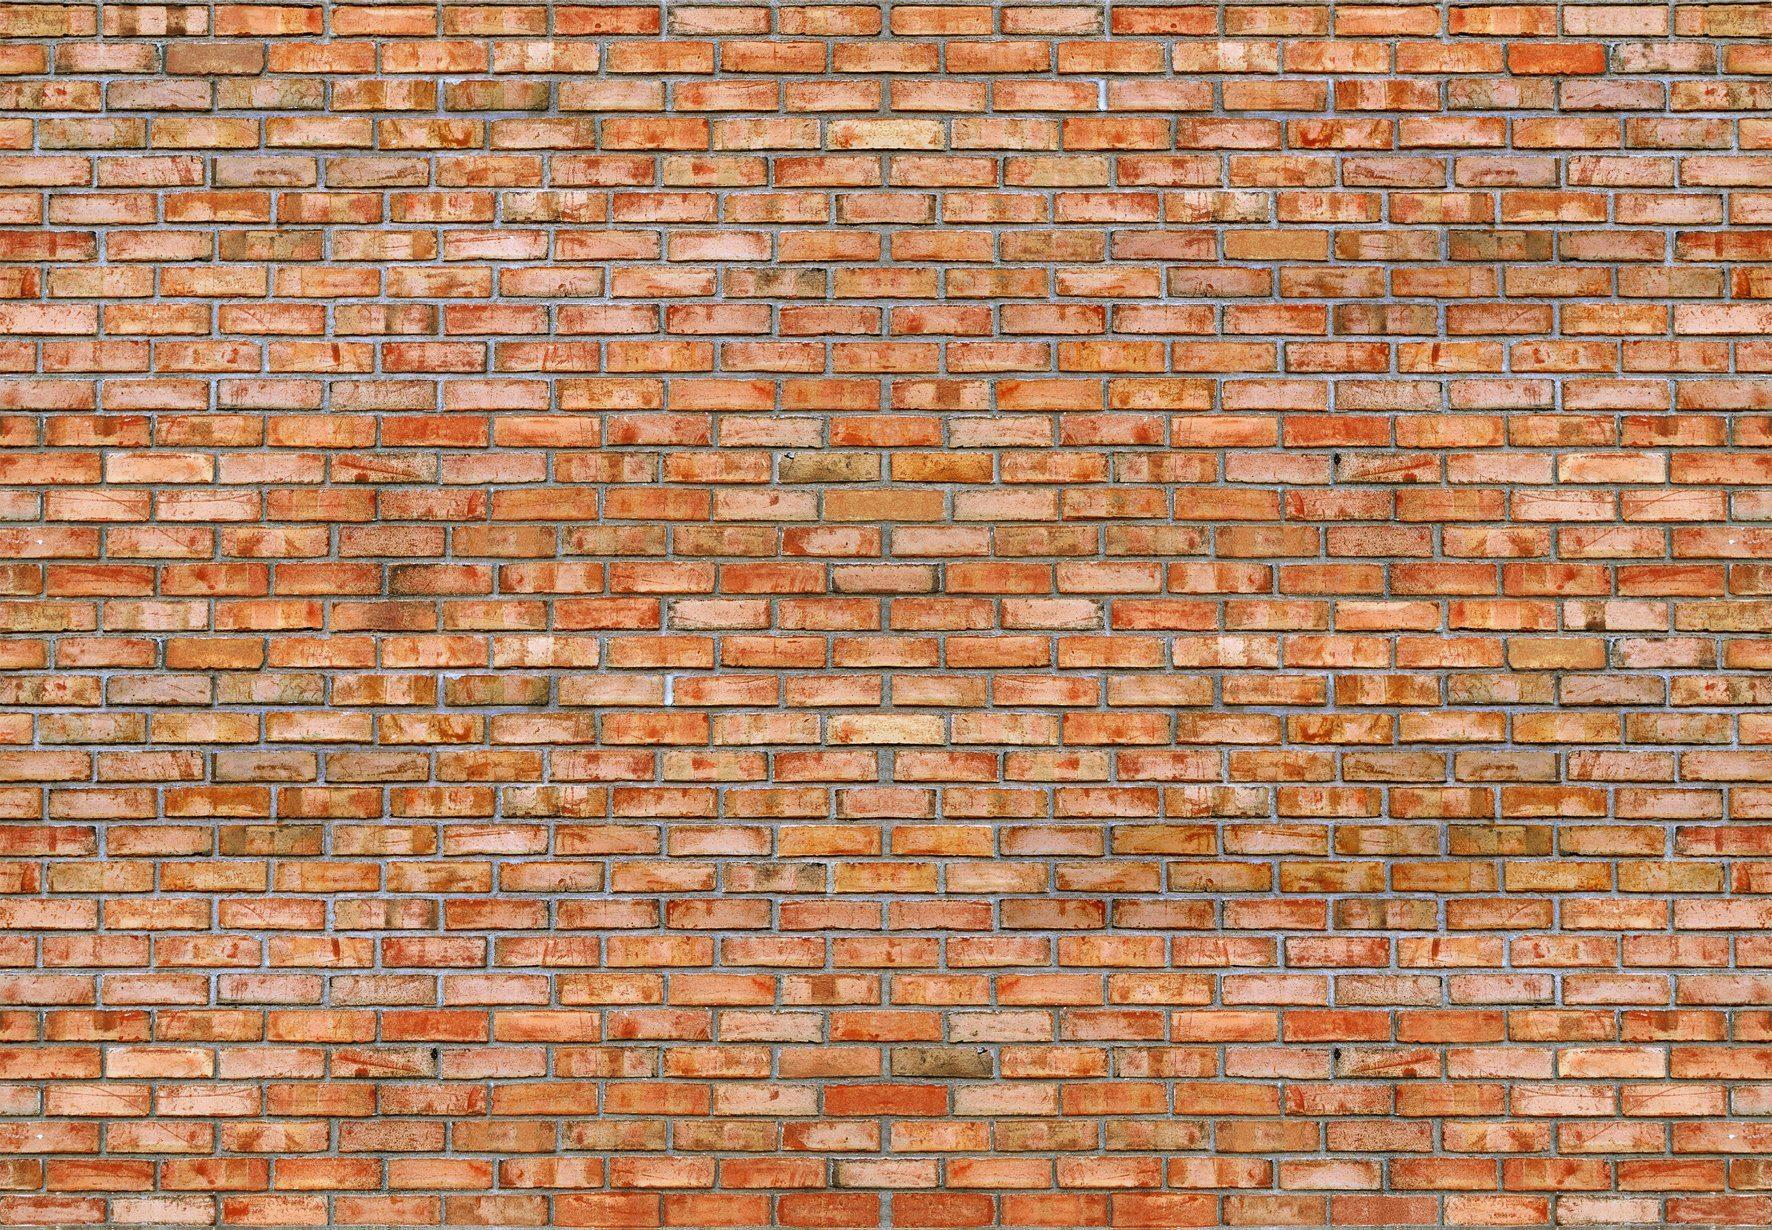 PAPERMOON Fototapete »Brickwall«, Vlies, 7 Bahnen, 350 x 260 cm